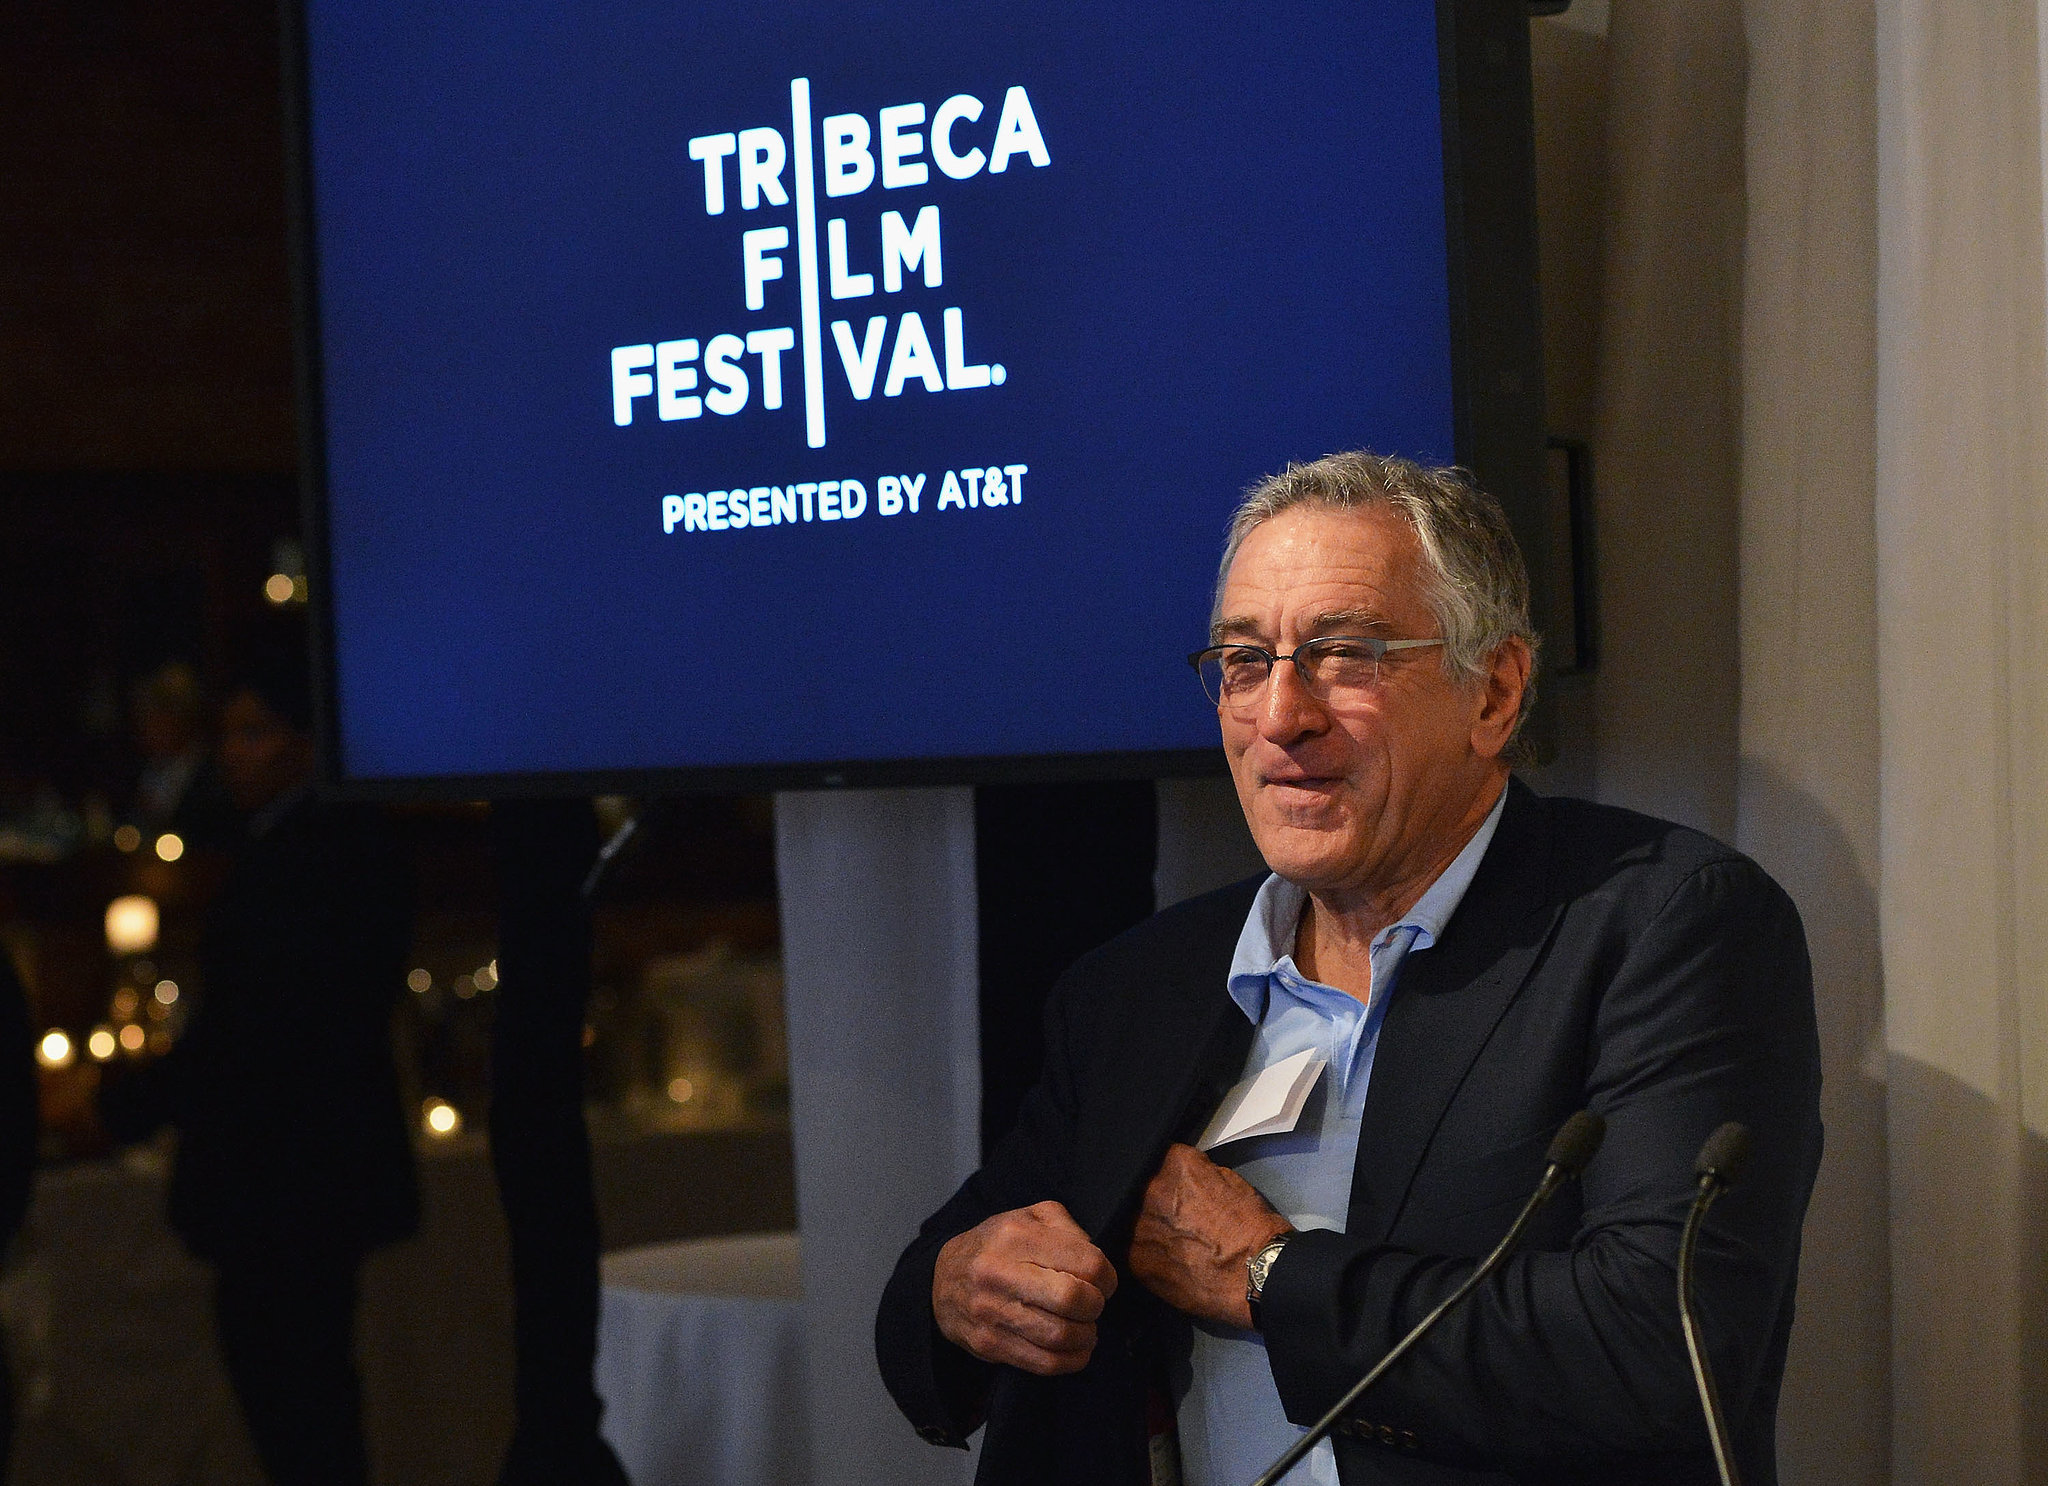 Tribeca Film Festival cofounder Robert De Niro hosted an opening event.